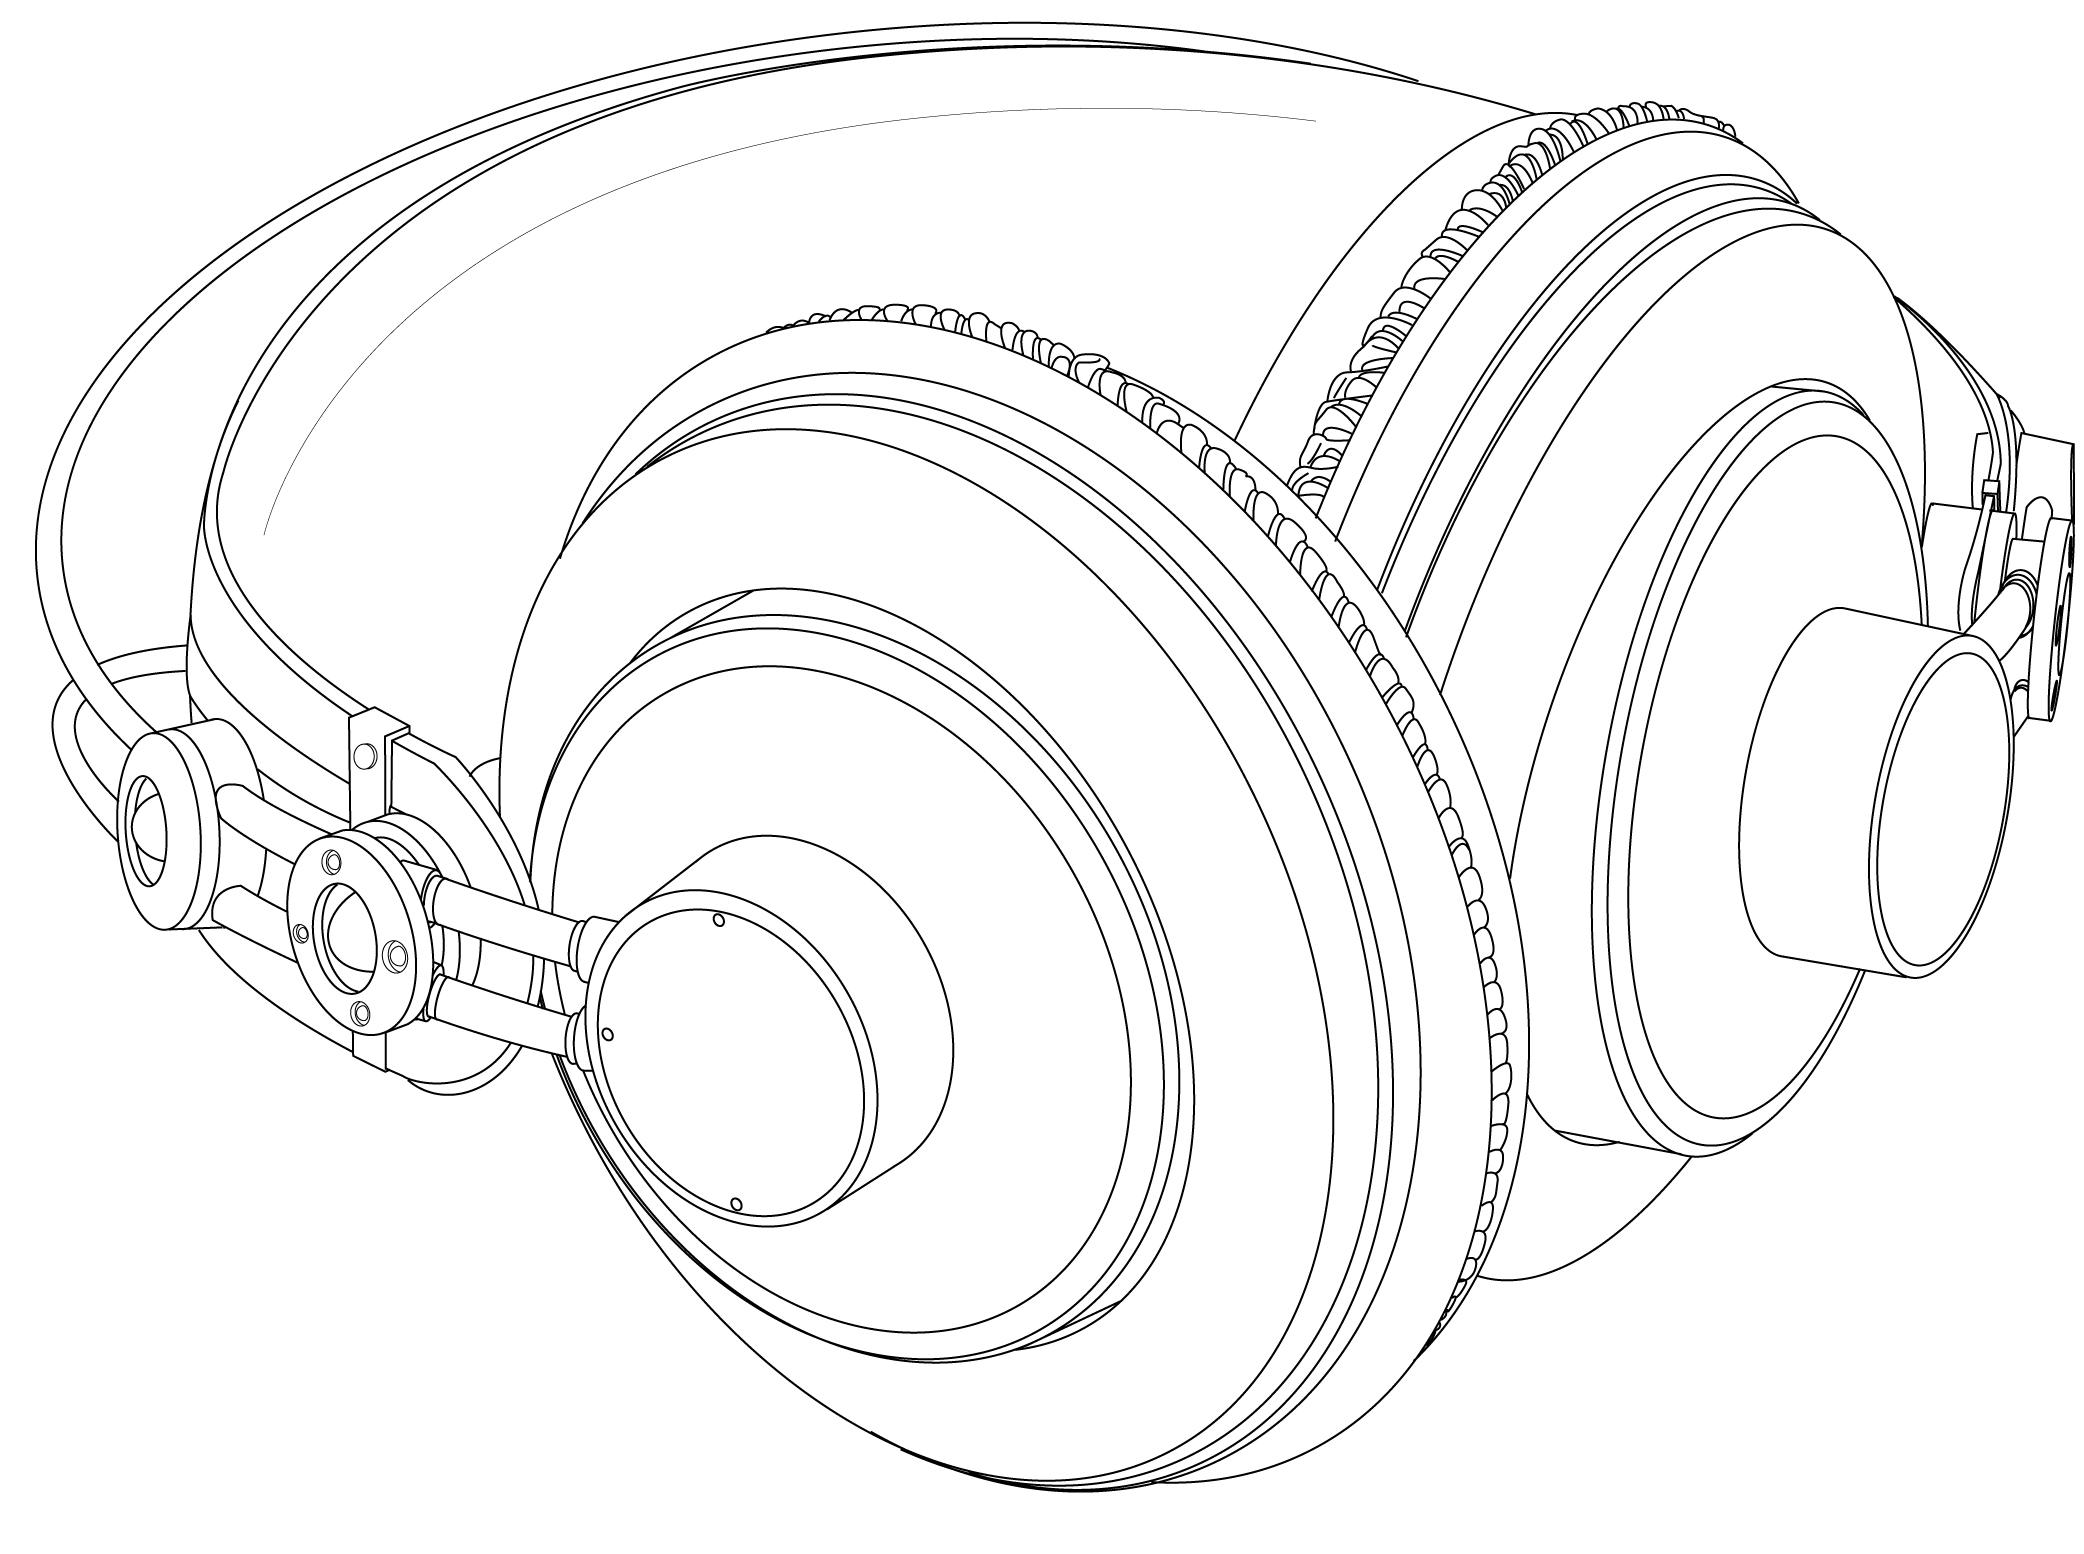 lineart drawing of headphones in illustrator